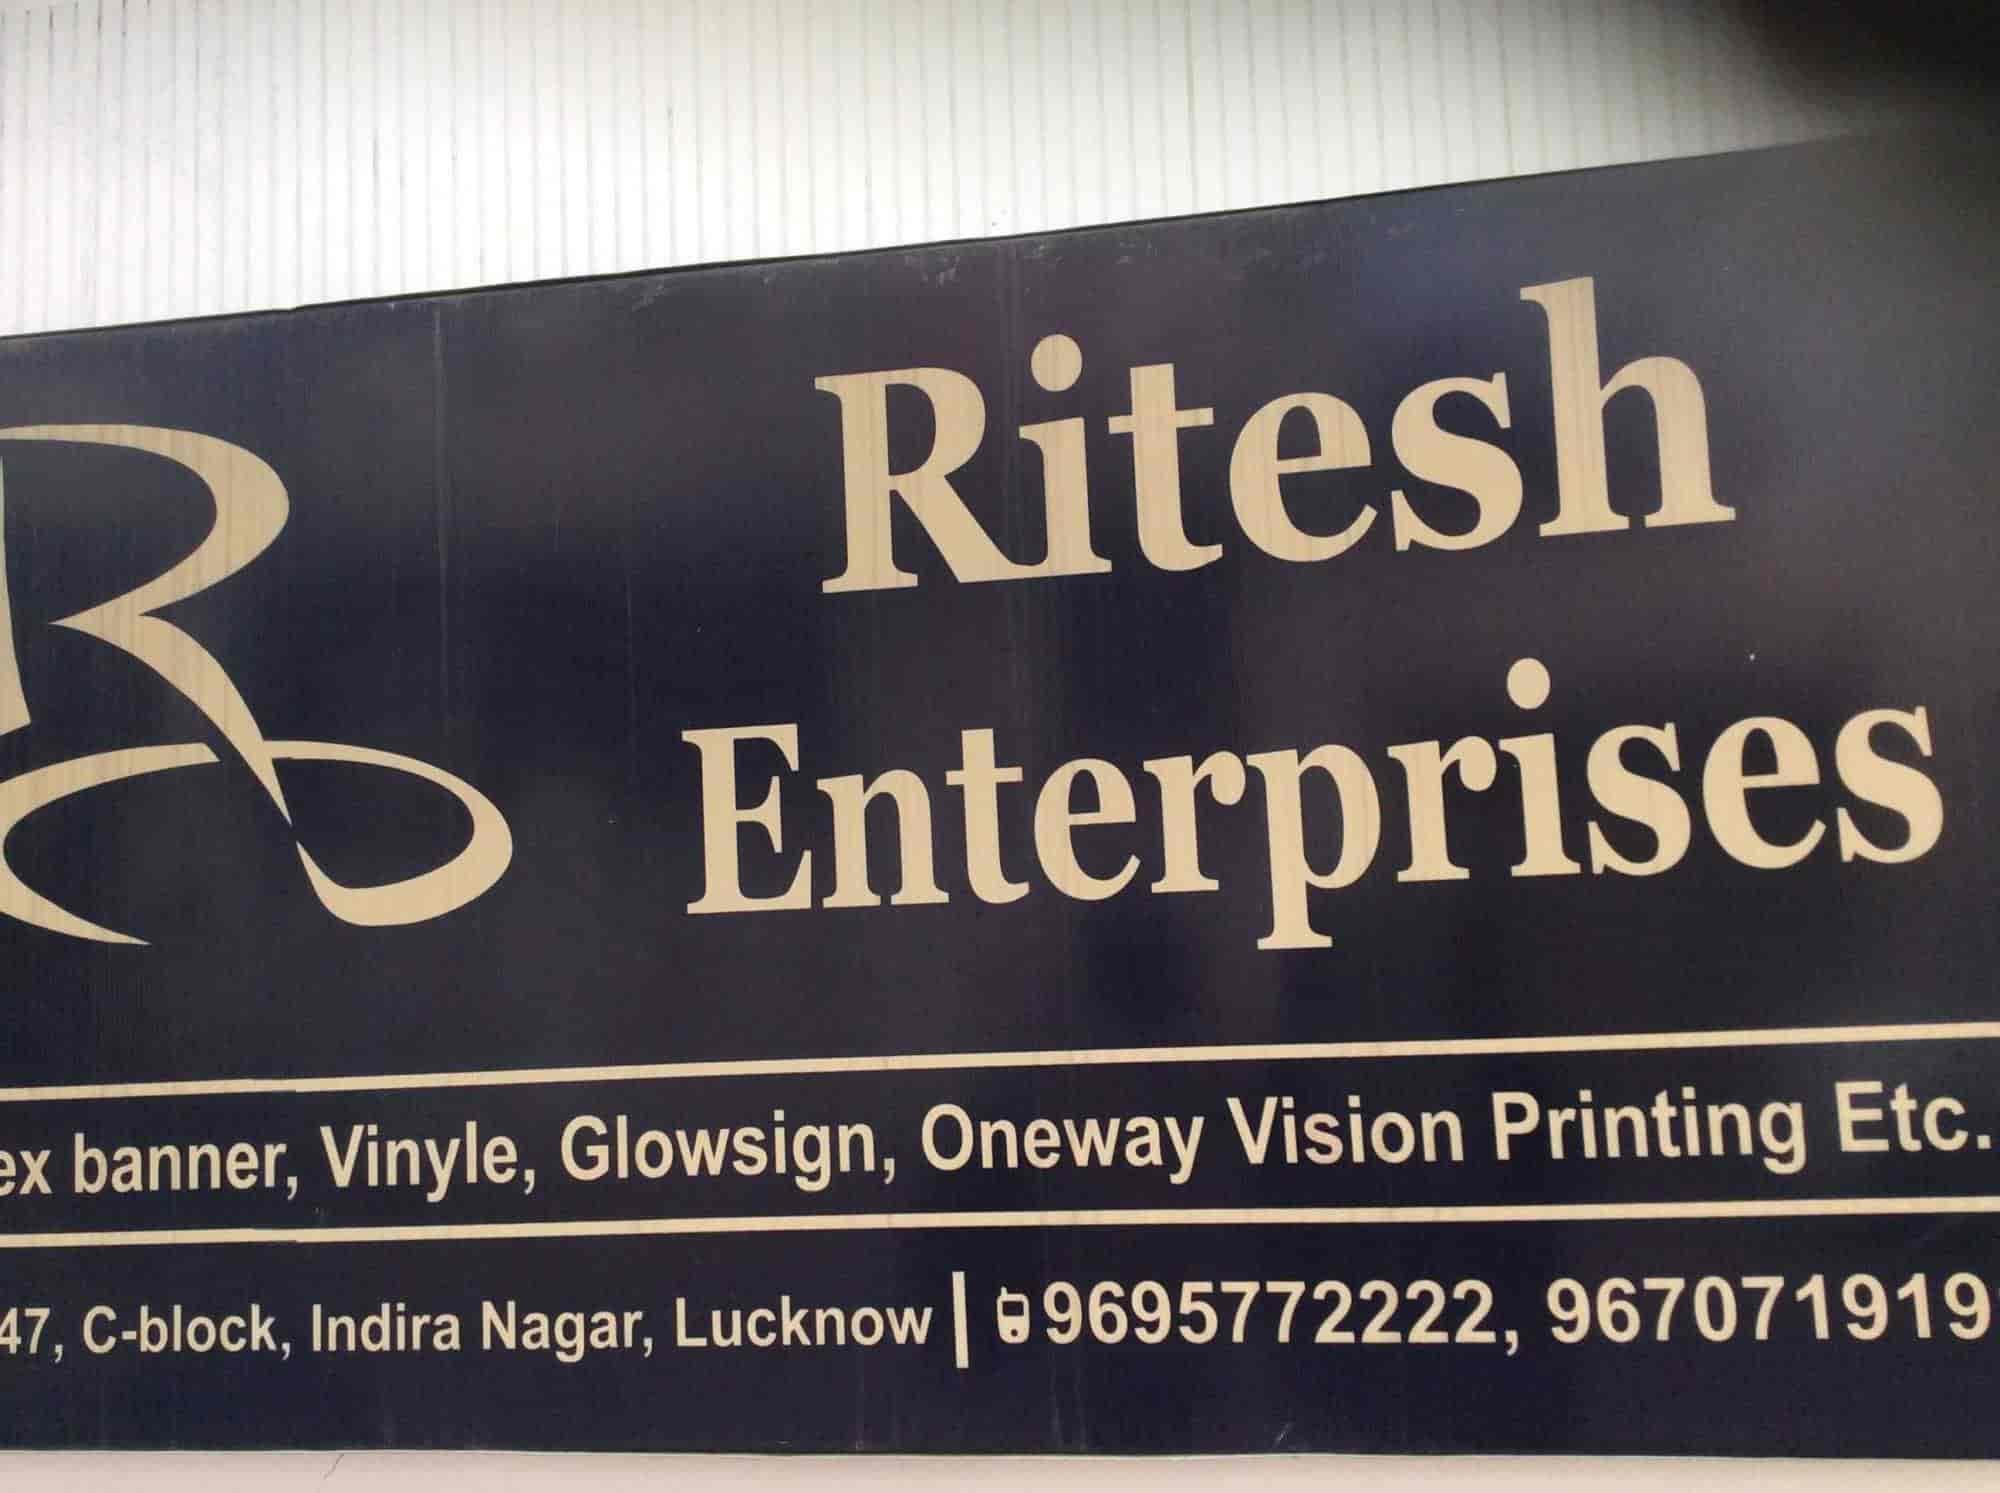 wedding card printers in bangalore indiranagar%0A Ritesh Enterprises  Indira Nagar Lucknow  Newspaper Advertising Agencies  in Lucknow  Justdial